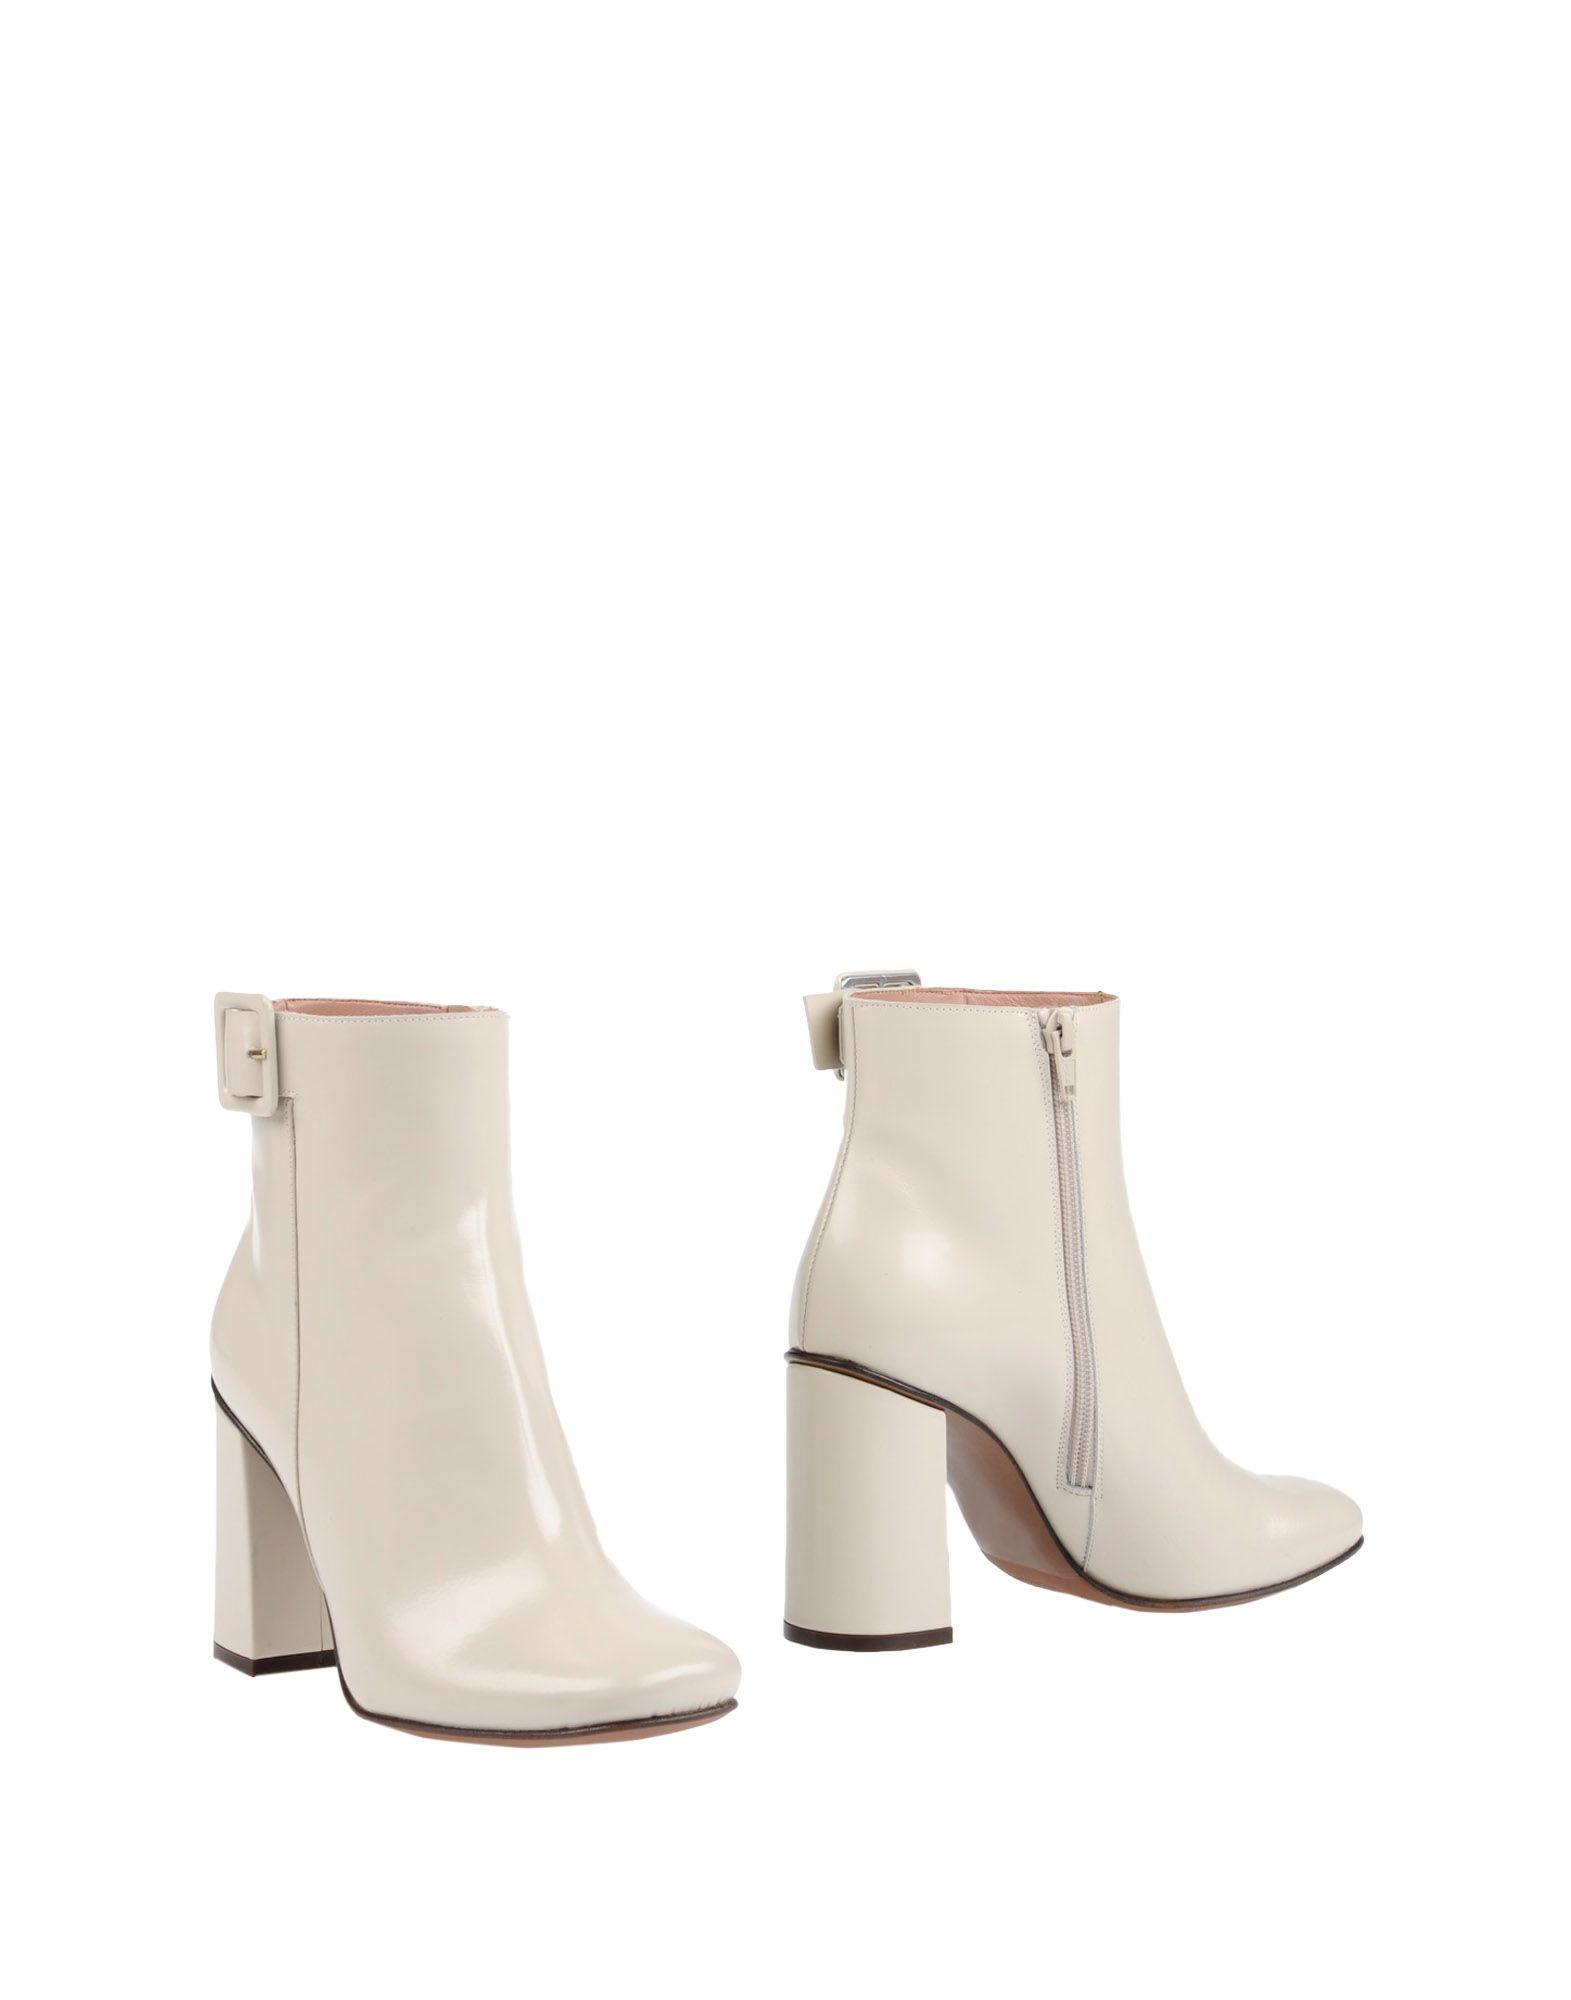 Rabatt Stiefelette Schuhe L' Autre Chose Stiefelette Rabatt Damen  11256146DM 2bfe84